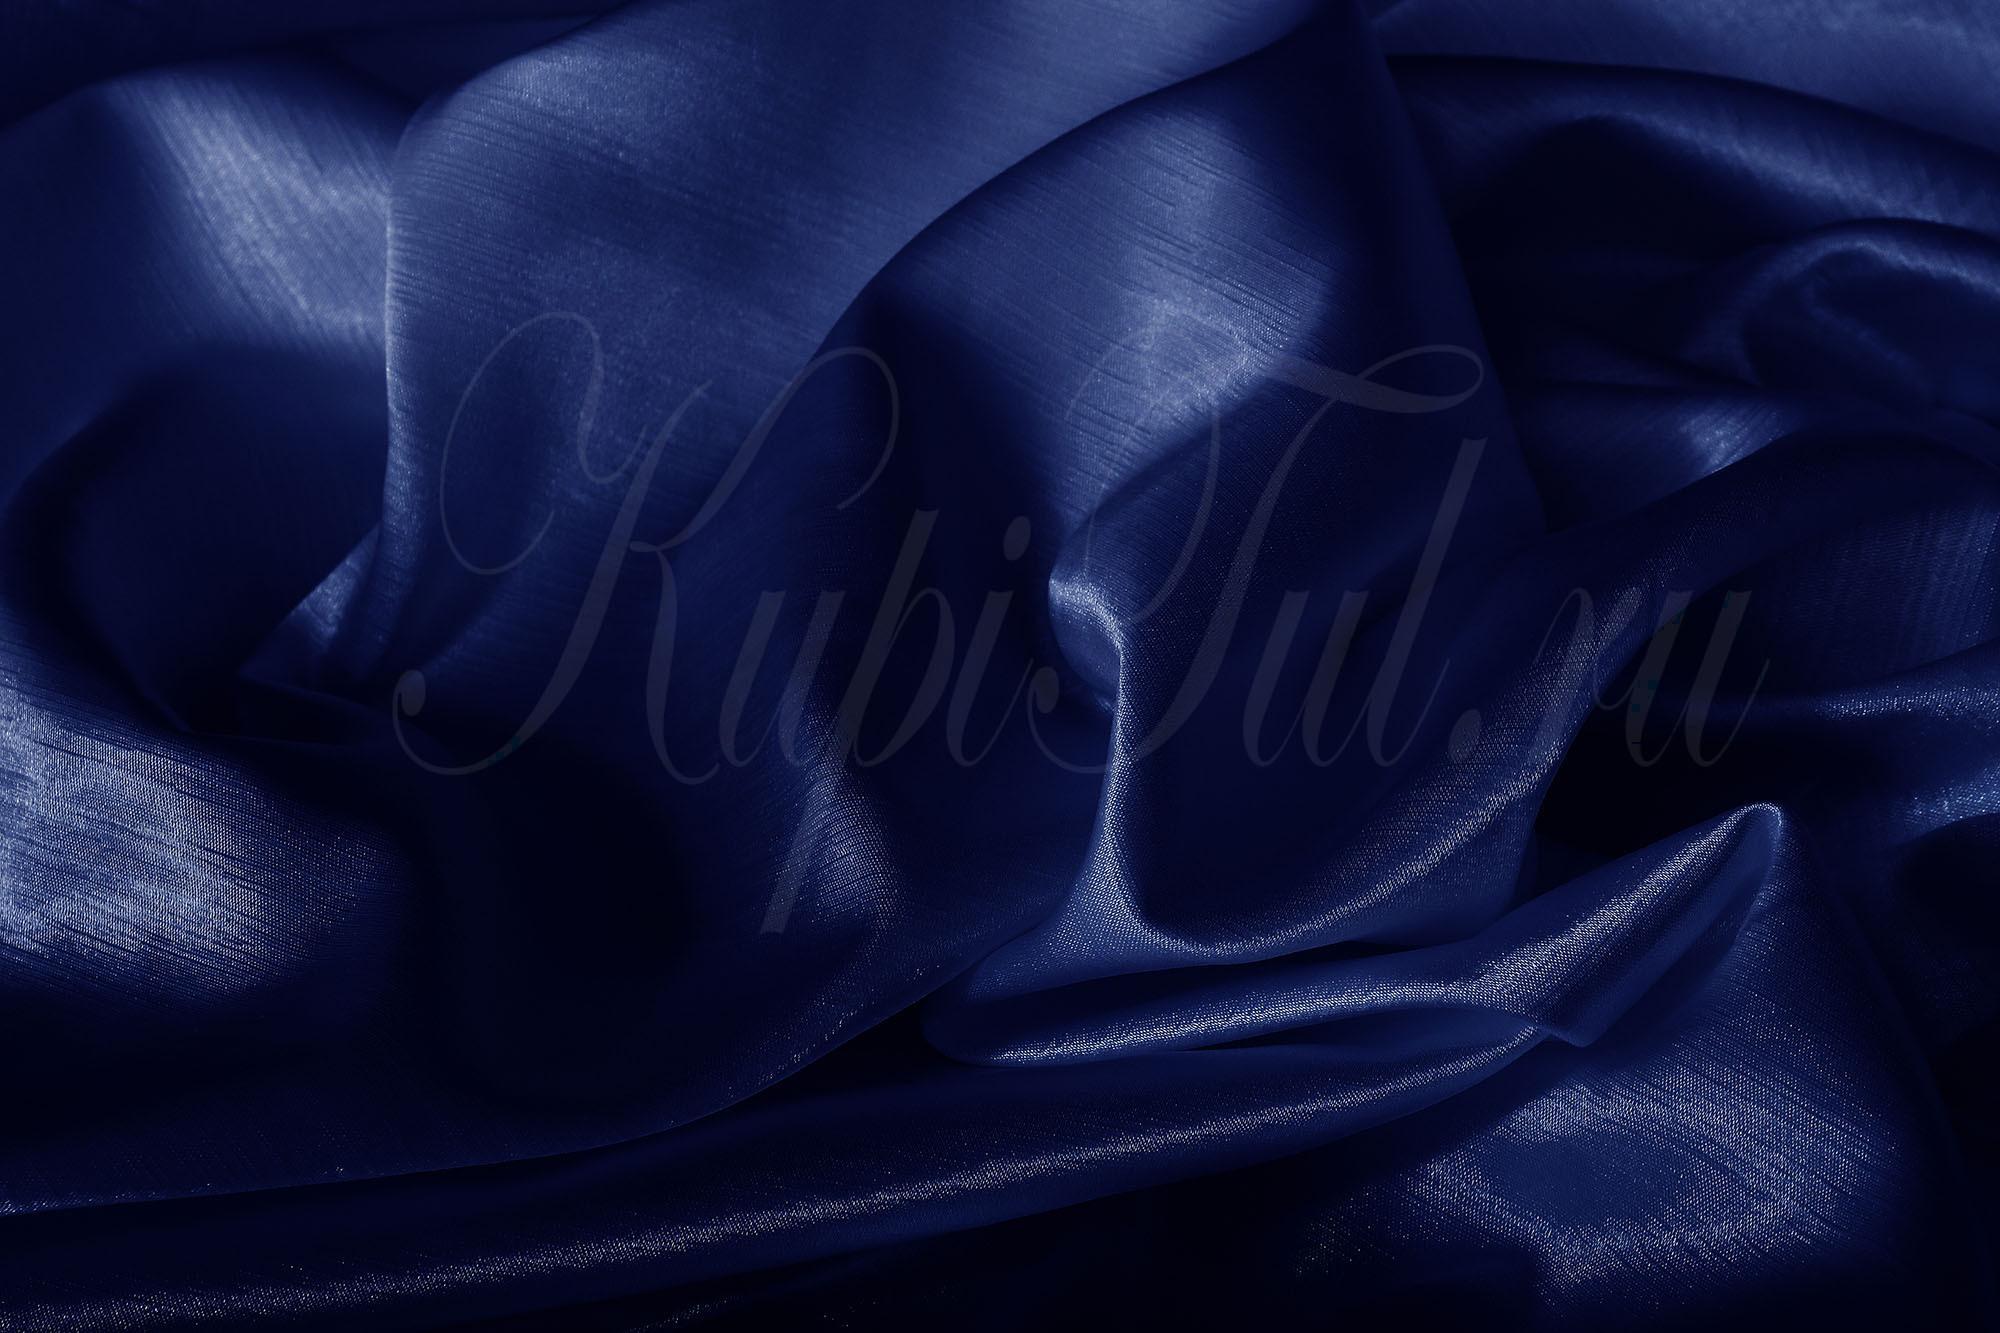 Leonardo (Синий), Шторы из однотонного шик-сатена.